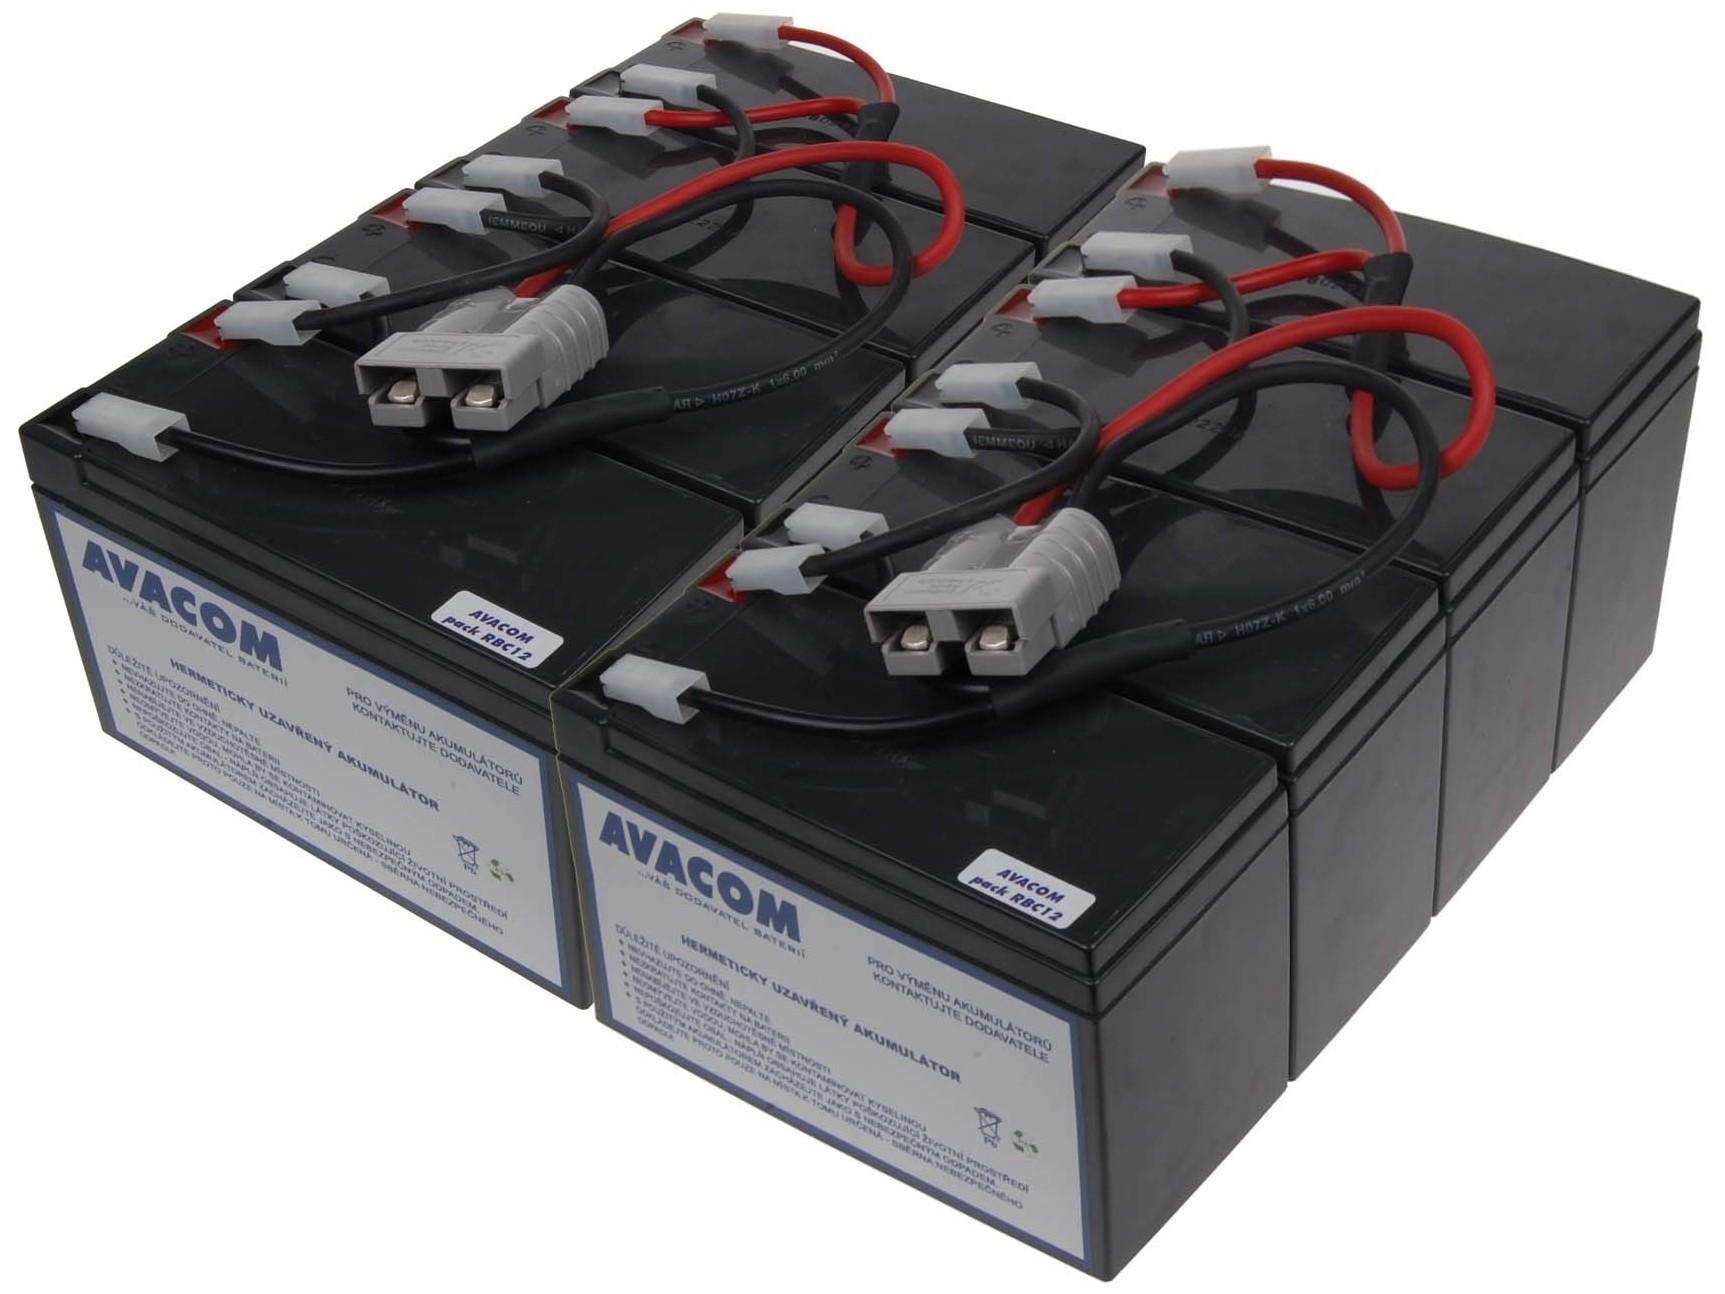 Baterie AVACOM AVA-RBC12 náhrada za RBC12 - baterie pro UPS - AVA-RBC12